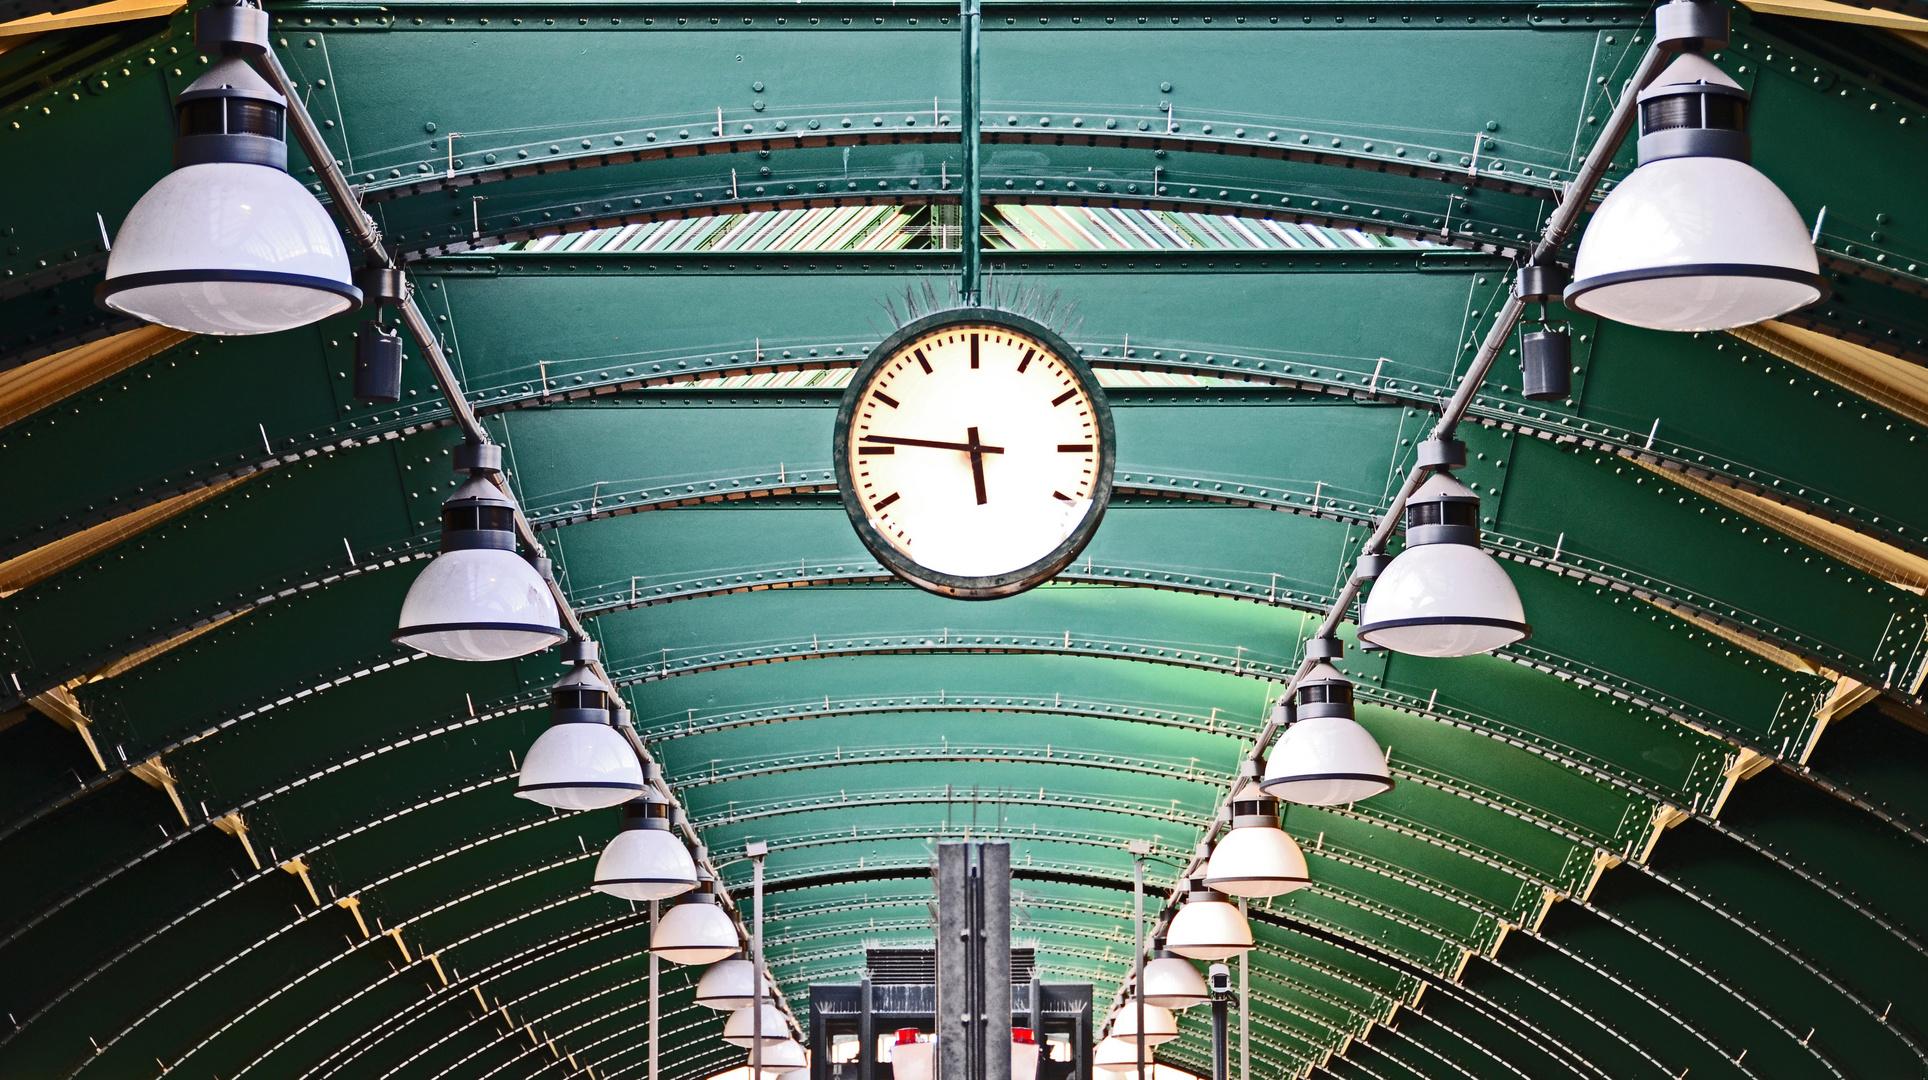 Berlin - Die Zeit ist knapp